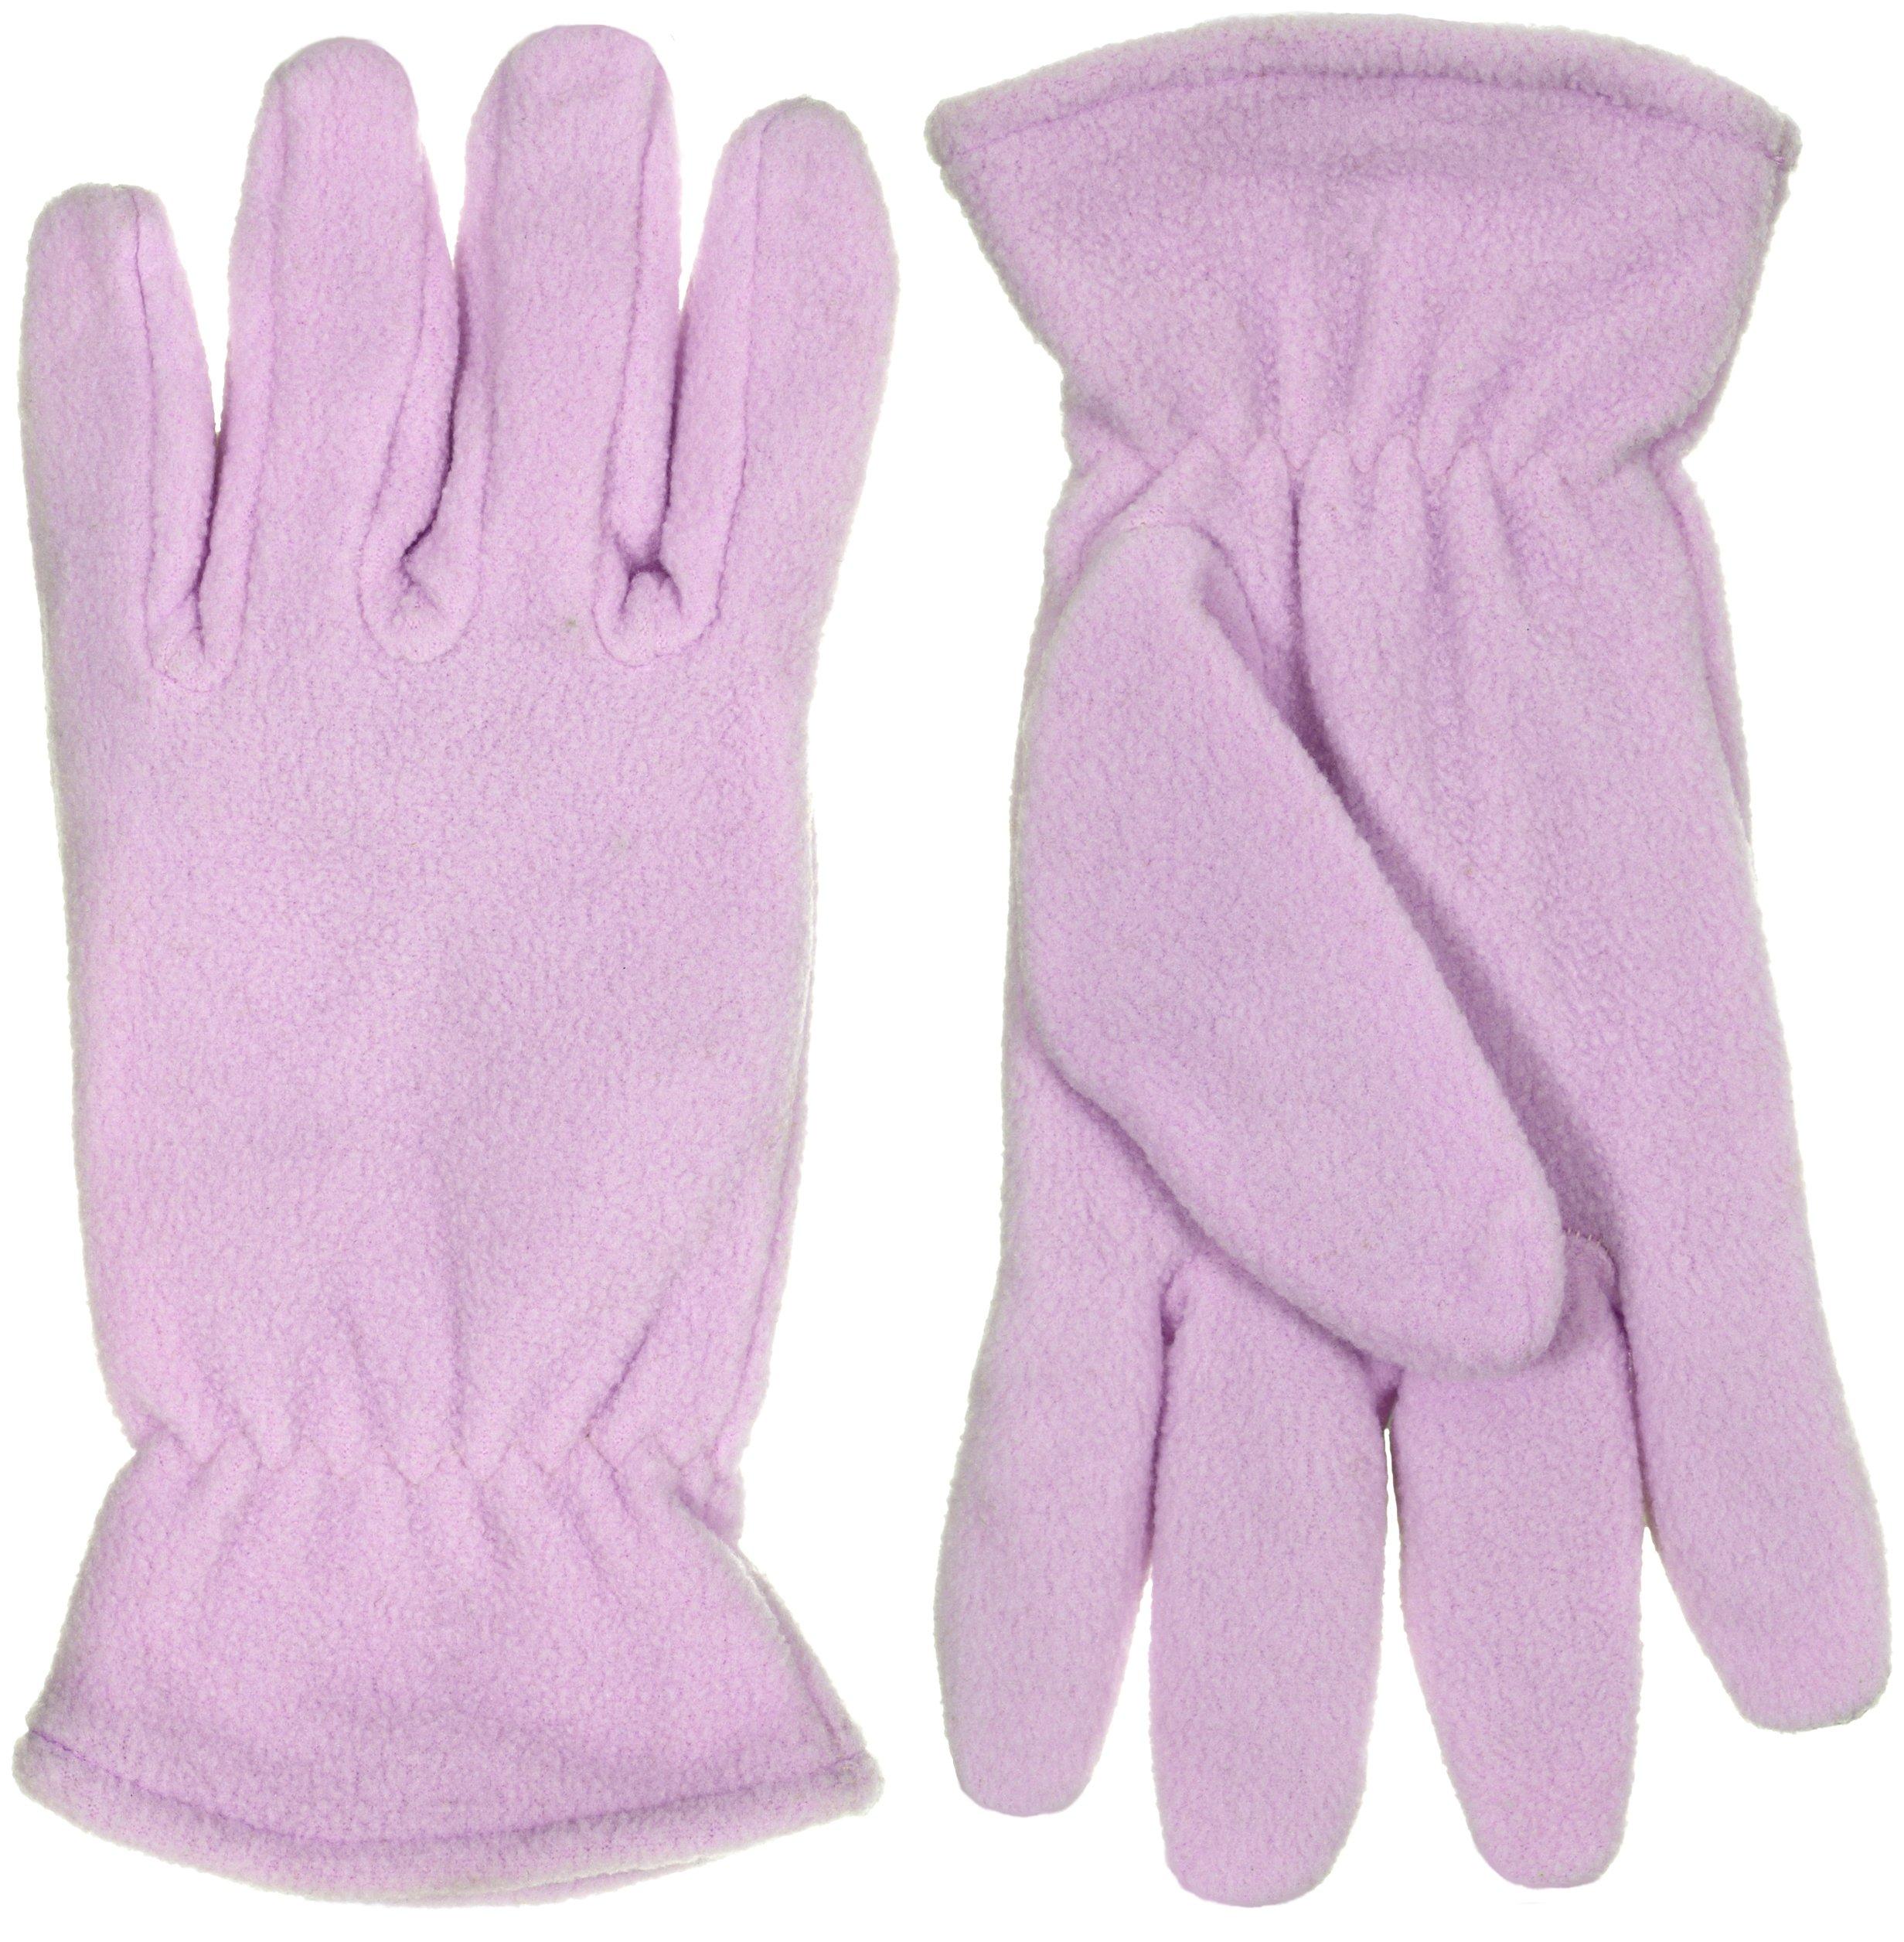 Women's Soft Fleece Cold Weather Gloves (Large, Lavender)